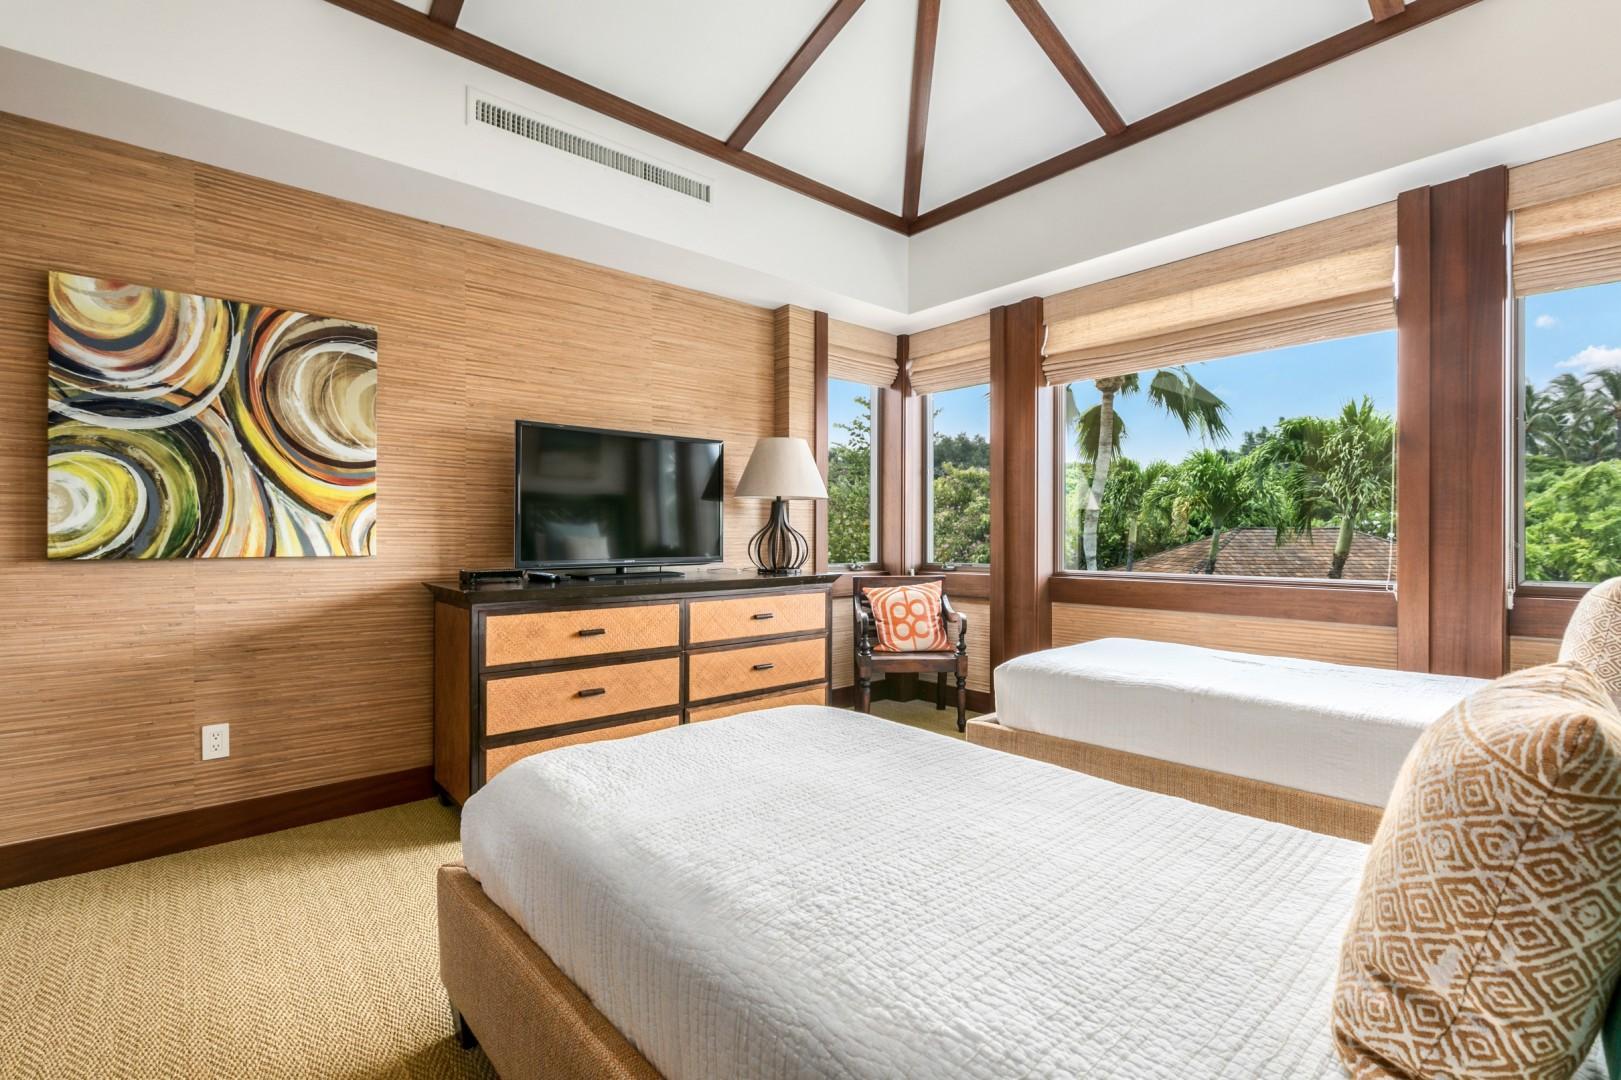 Alternate View of Third Bedroom with En Suite Bath.